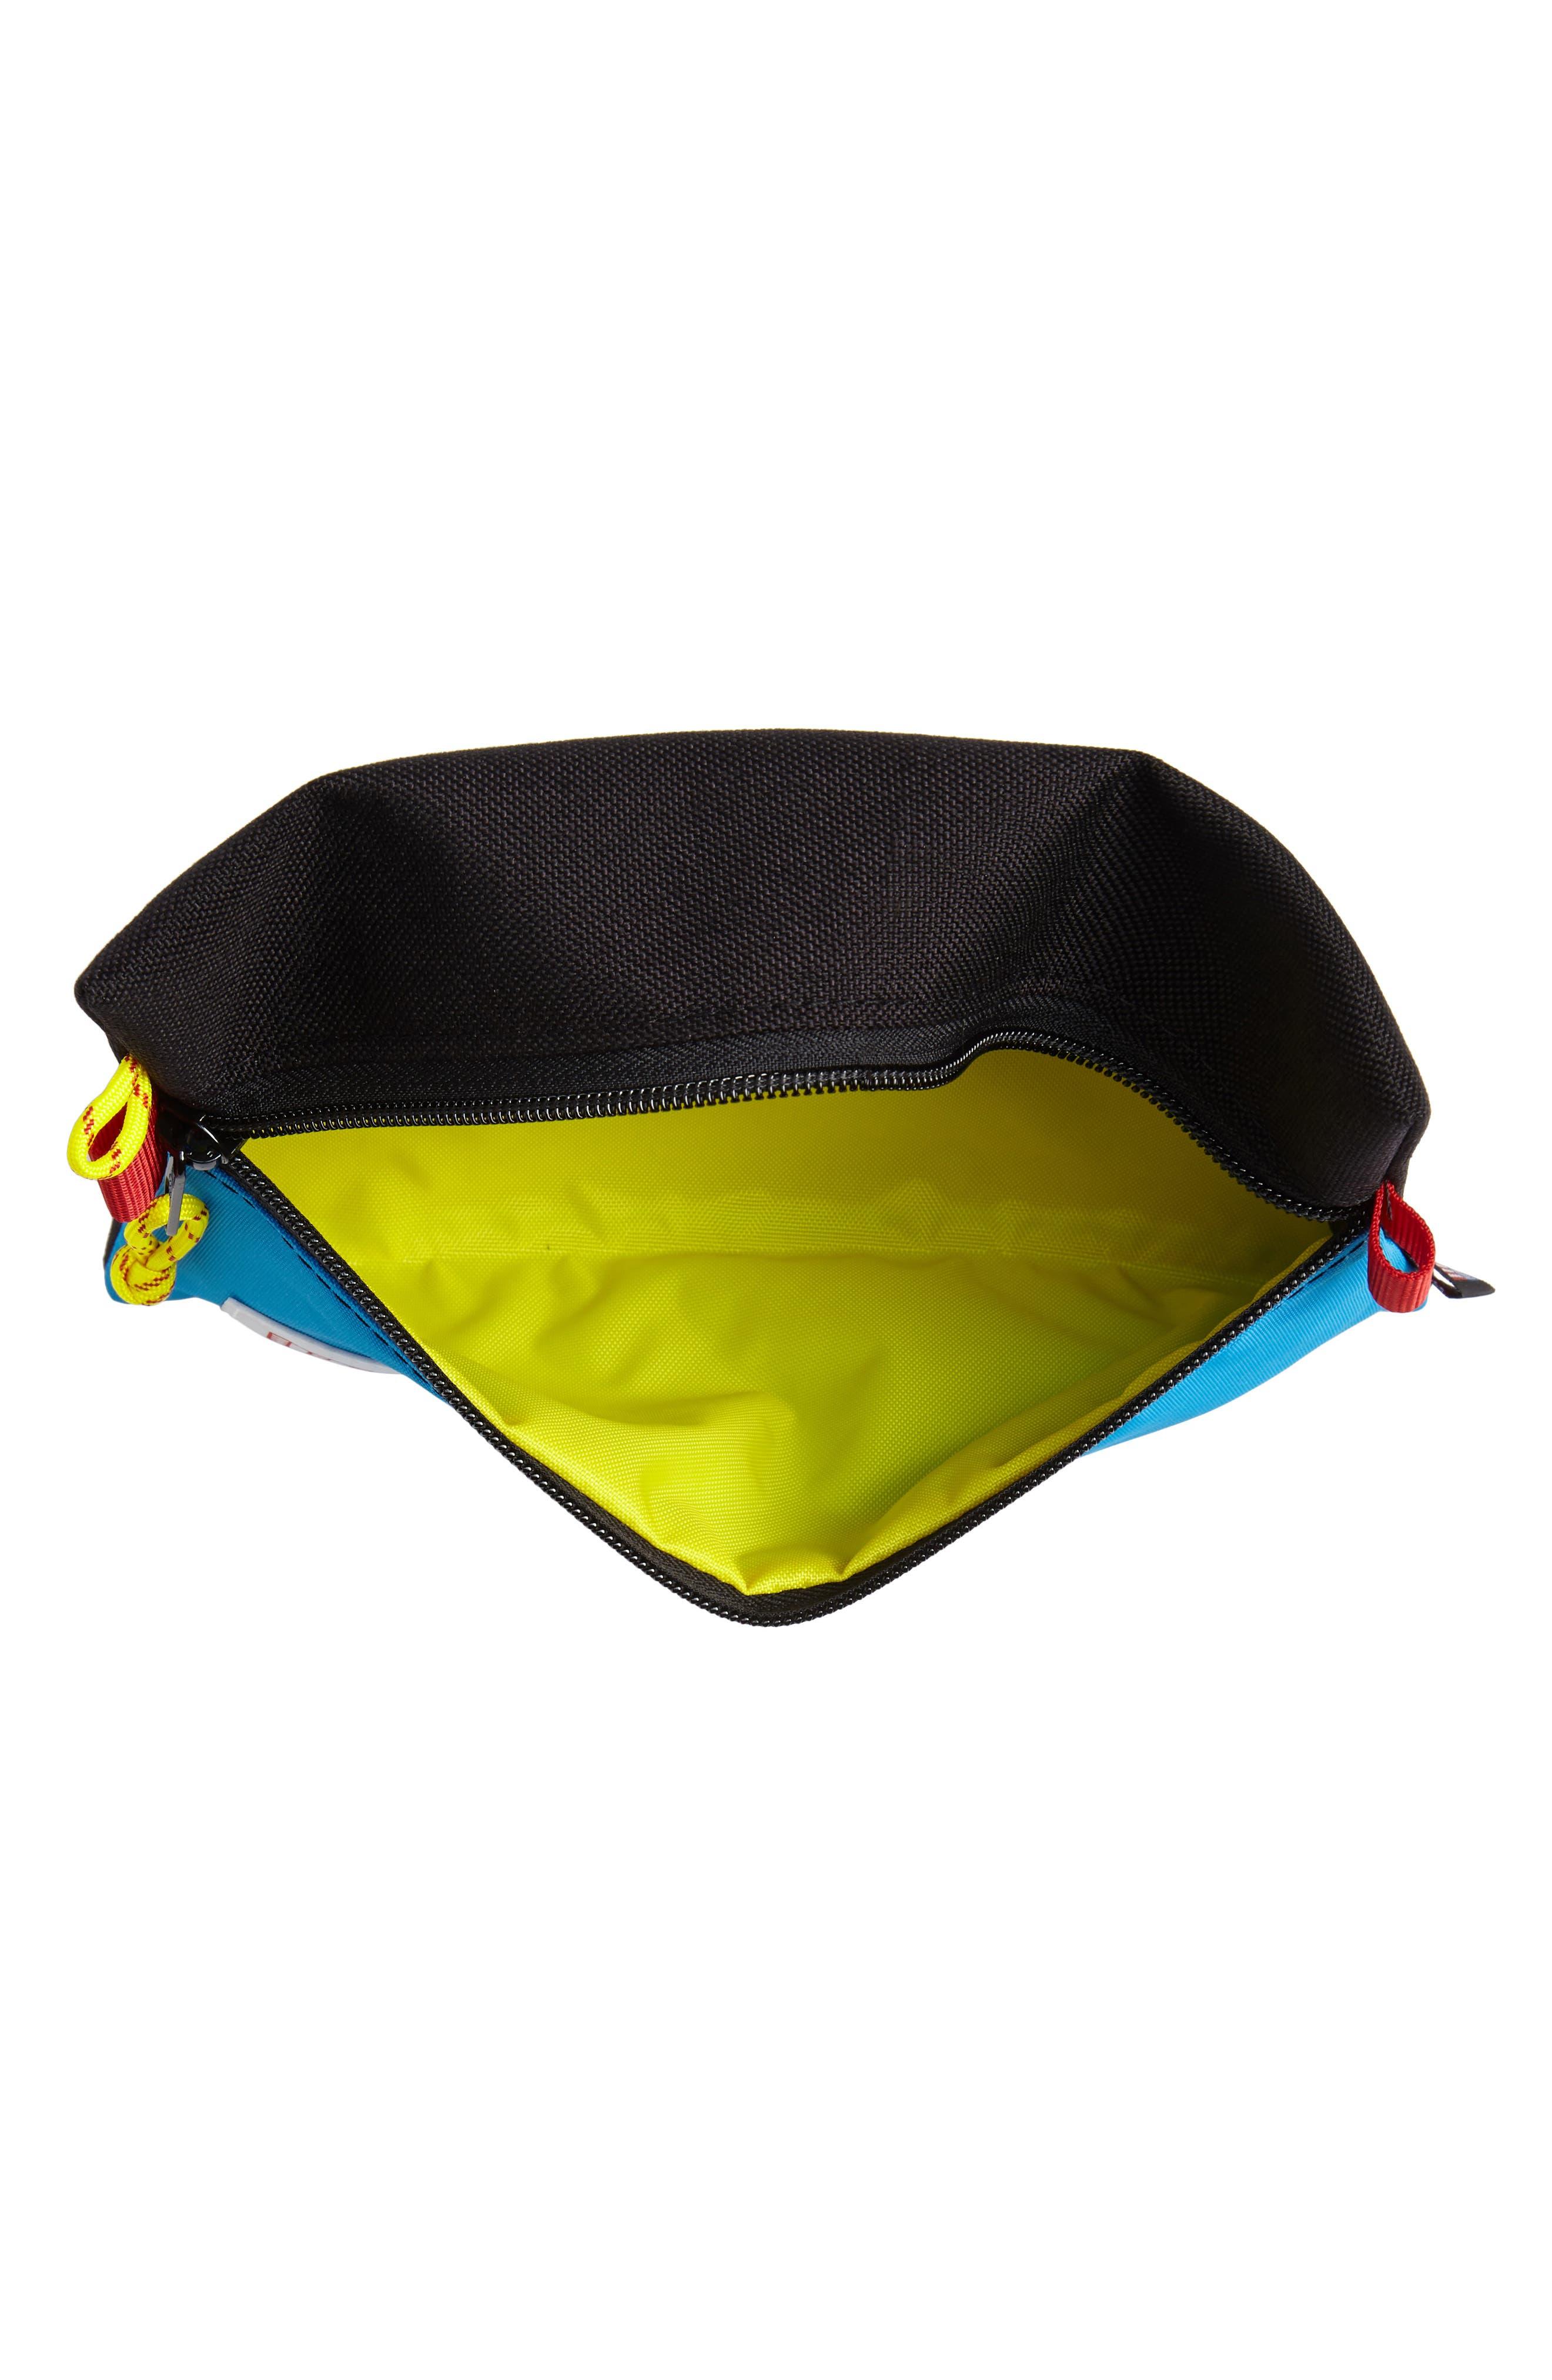 TopoDesigns Accessory Bag,                             Alternate thumbnail 3, color,                             BLACK/ ROYAL